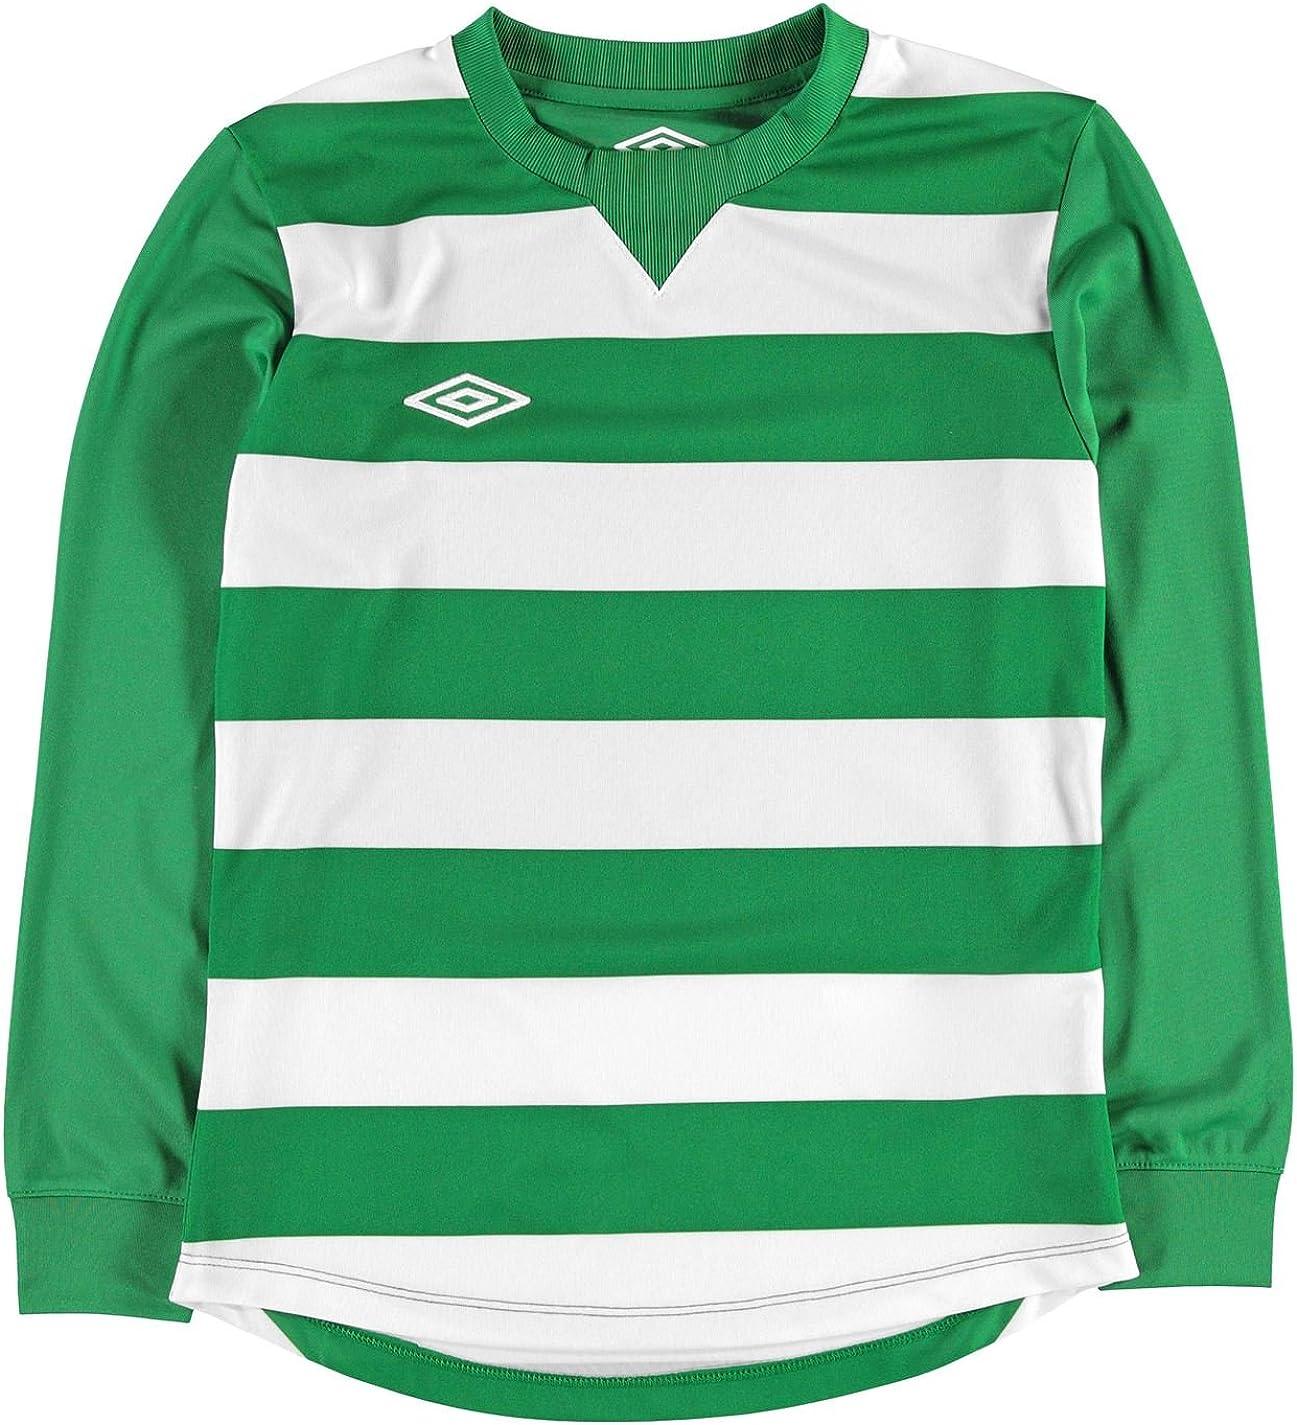 Umbro - Camisa Deportiva - Manga Larga - para niño Emerald ...